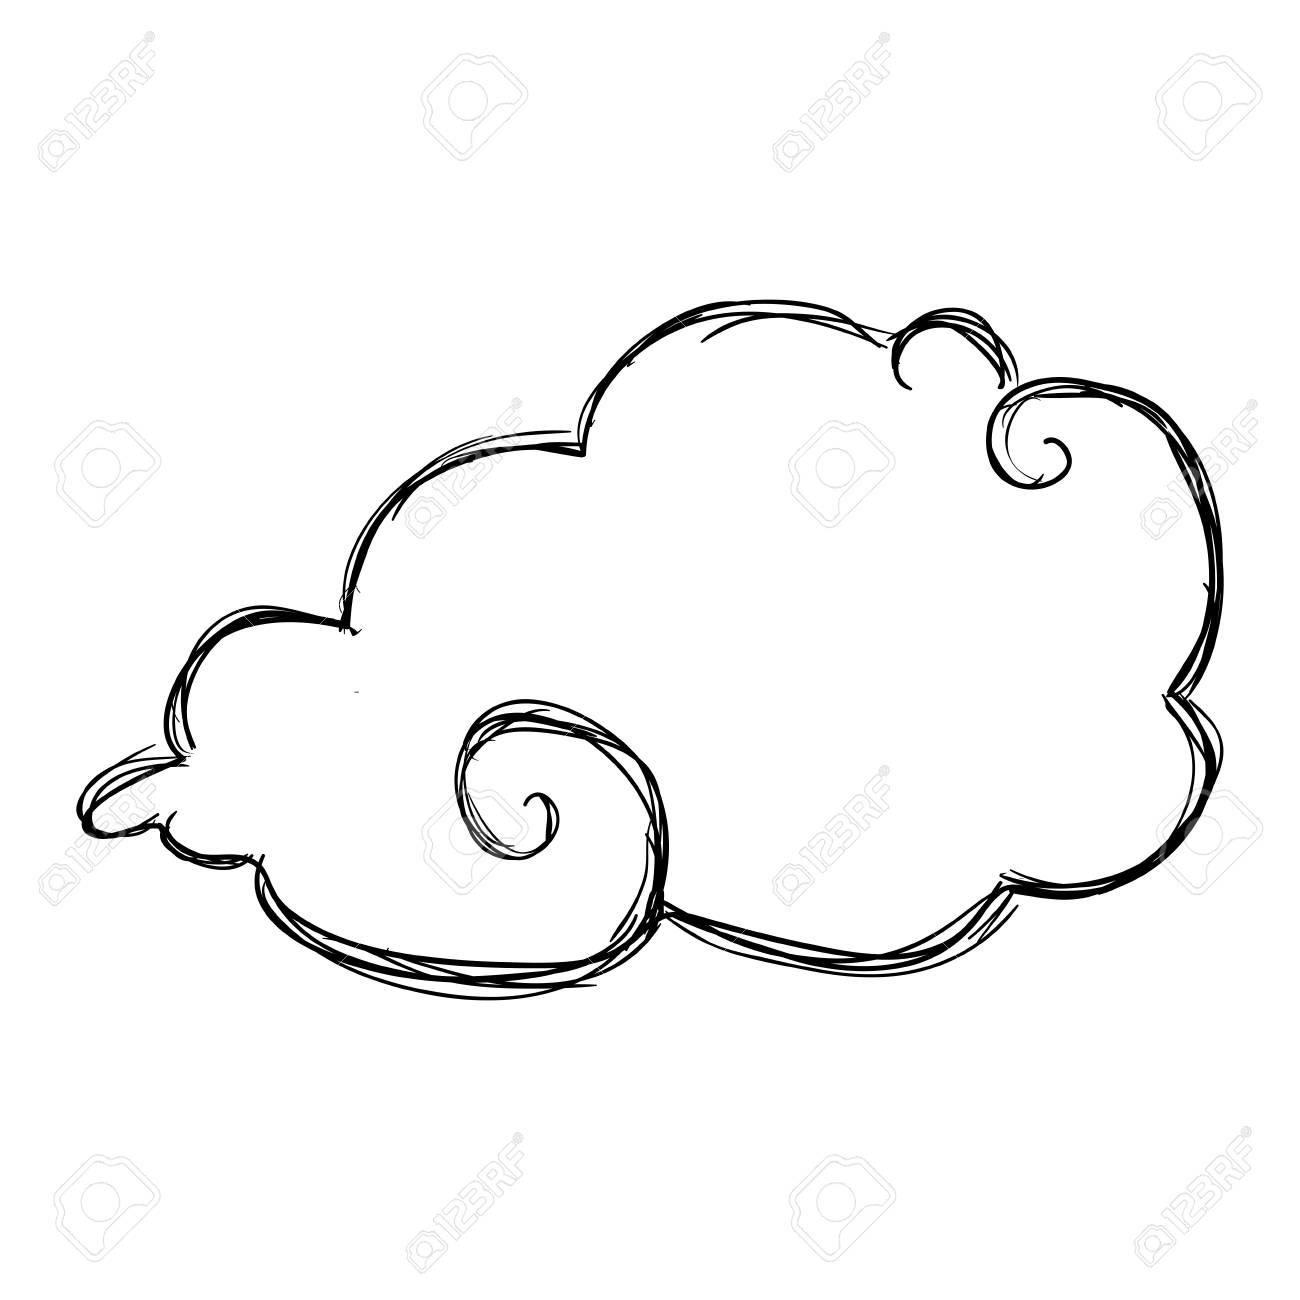 Cloud doodle draw icon vector illustration graphic design